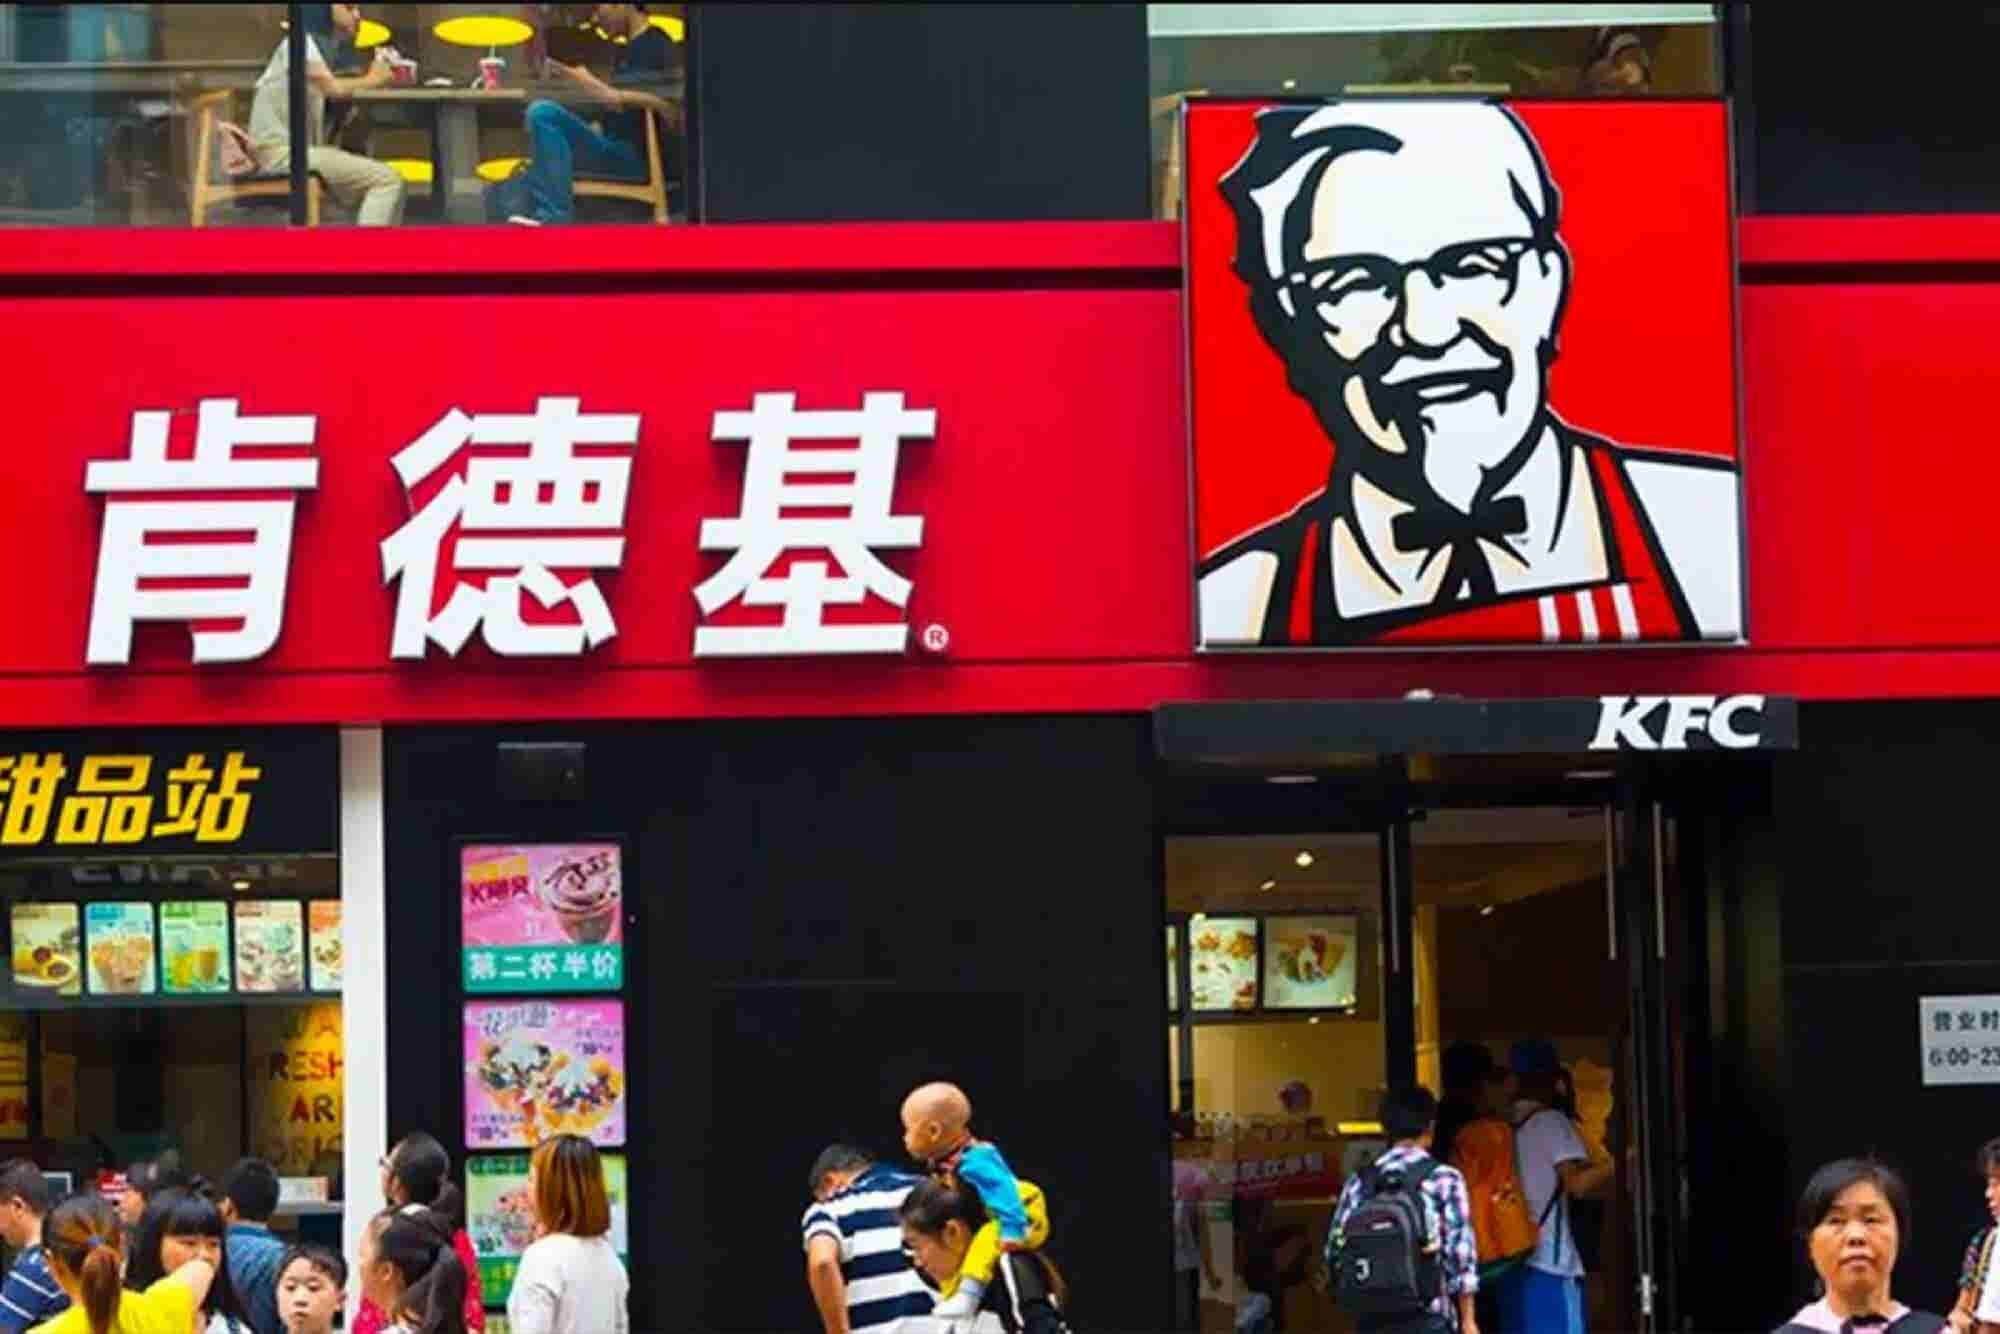 KFC Now Has a Branded Smartphone